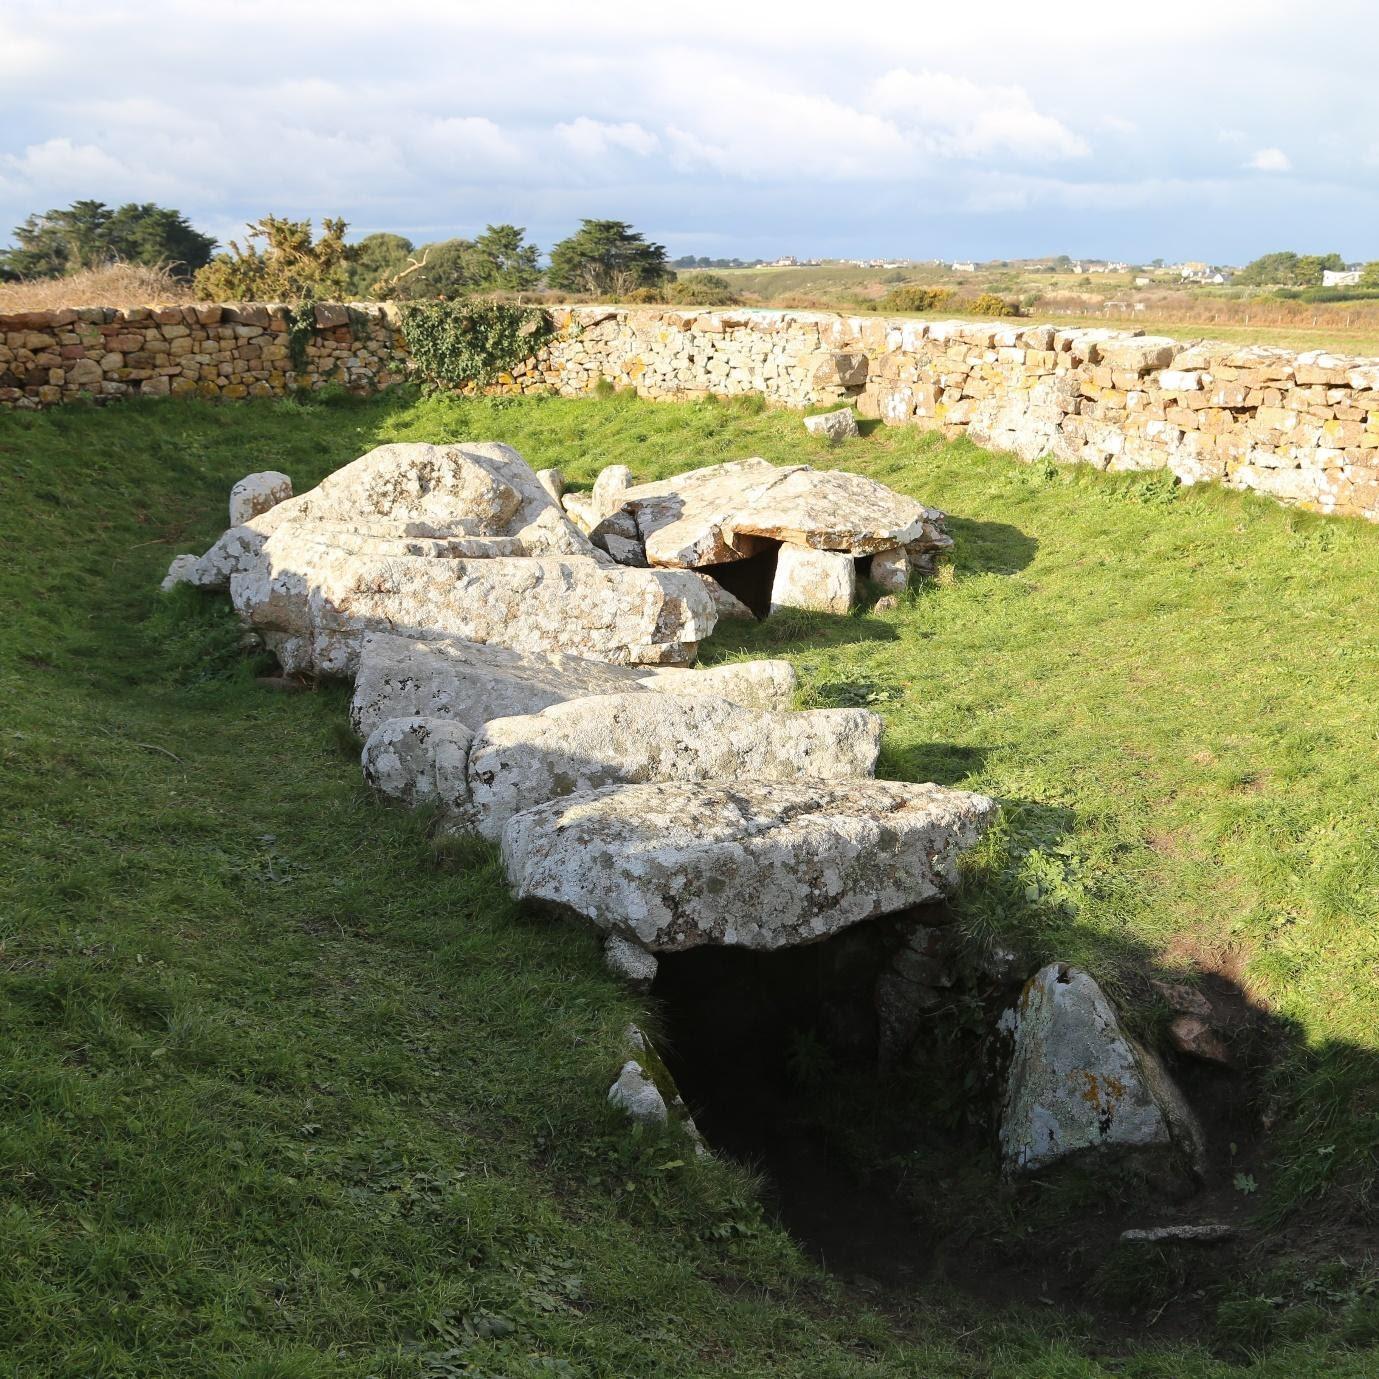 Grantez dolmen